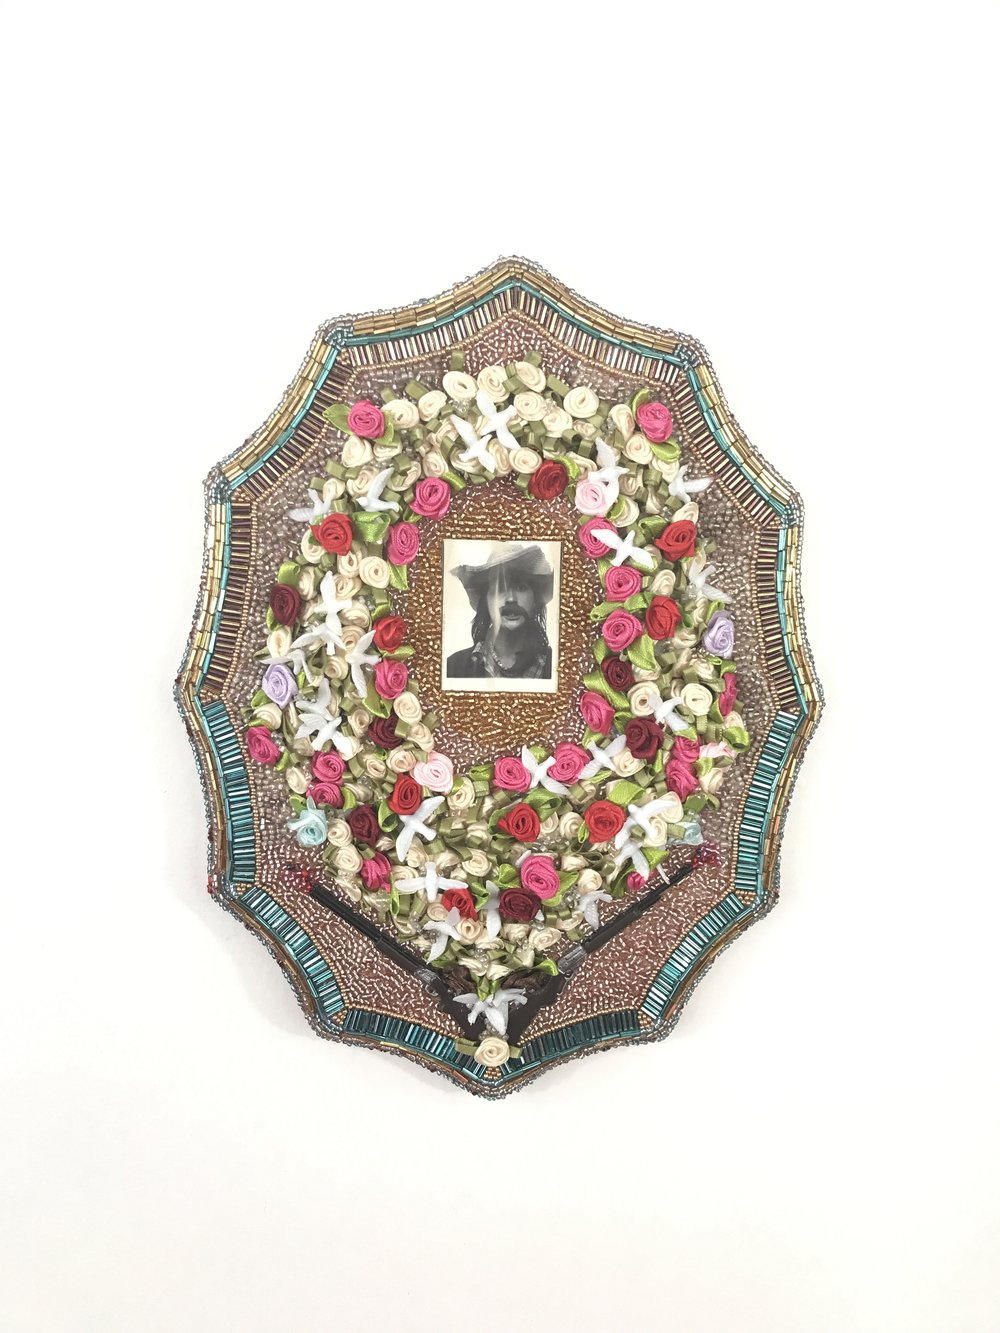 Nacho AKA Paloma - Multimedia assemblage (photograph, beads, miniatures), 2017